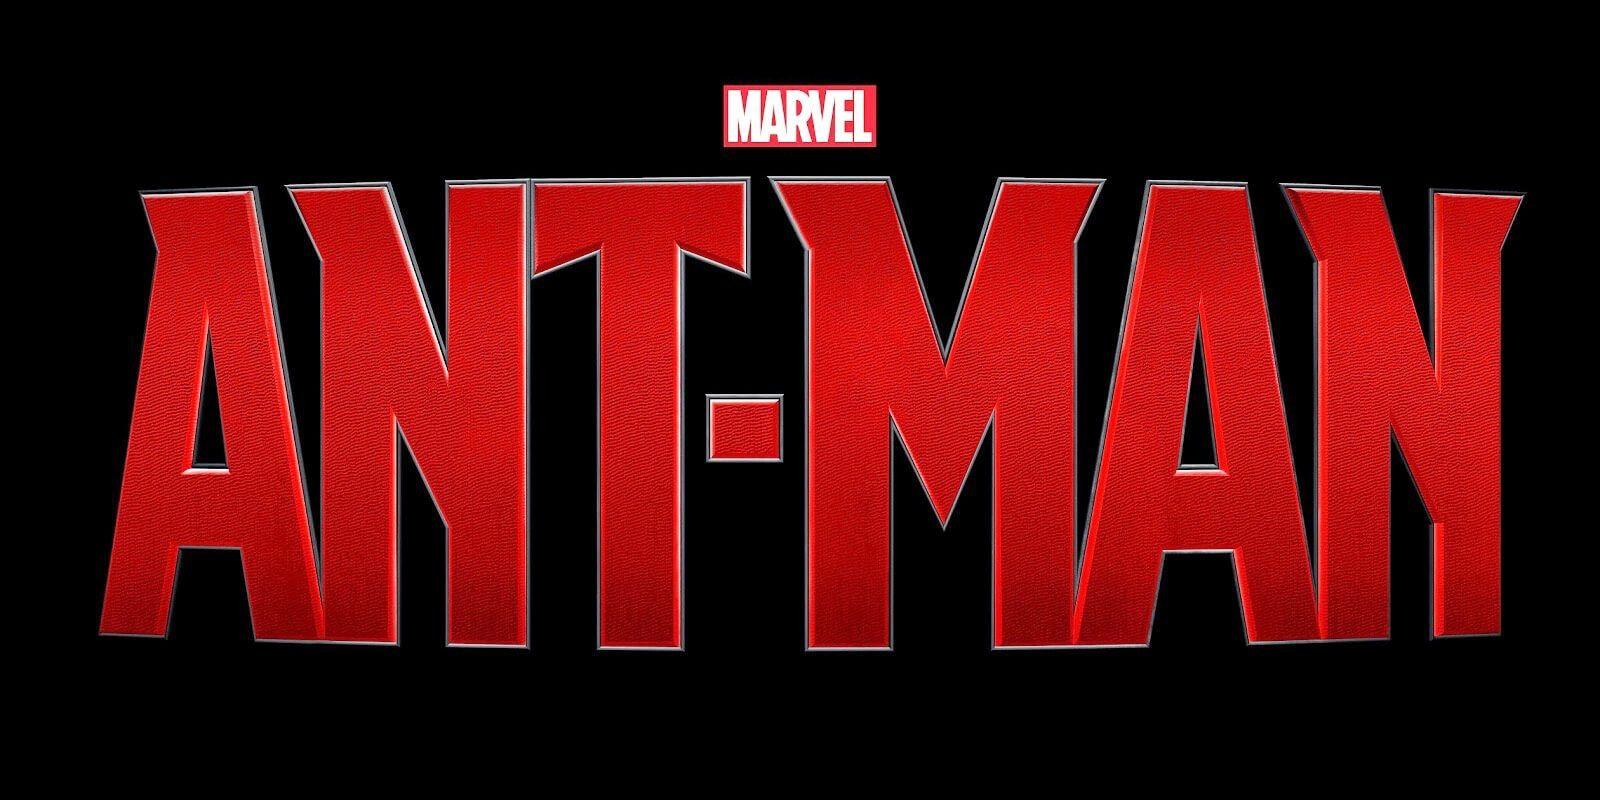 Ant Man Logo Ant Man Ant Man Movie Marvel Avengers Movies